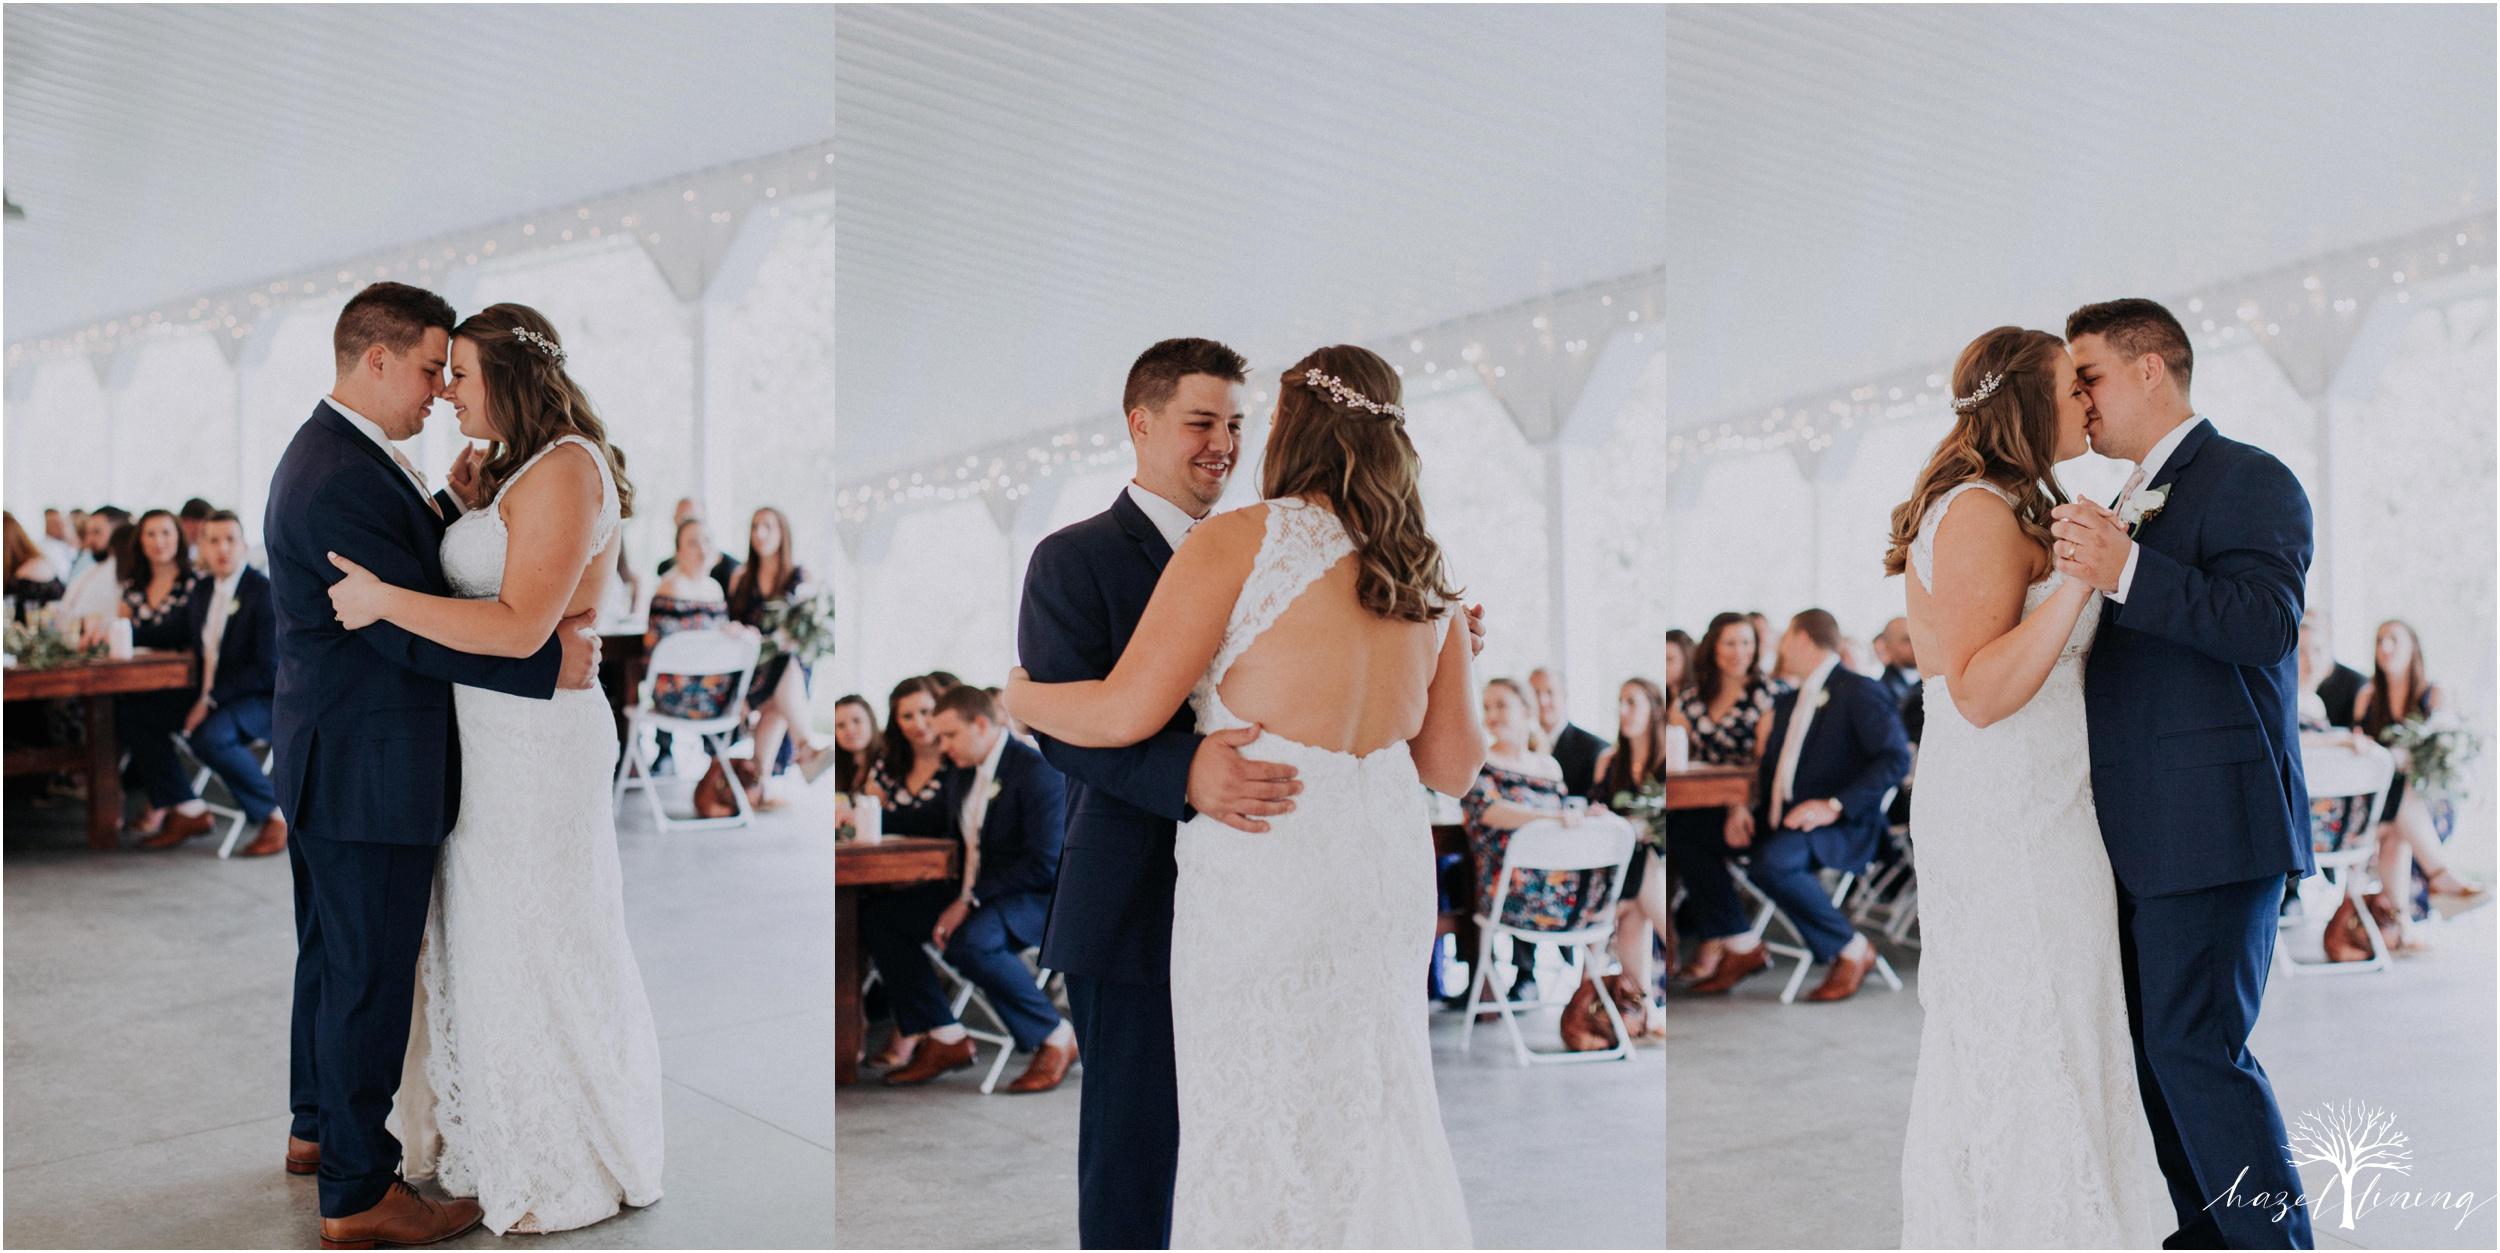 hazel-lining-travel-wedding-elopement-photography-abby-skyler-hunt-the-willis-house-york-pennsylvania-outdoor-estate-wedding_0110.jpg